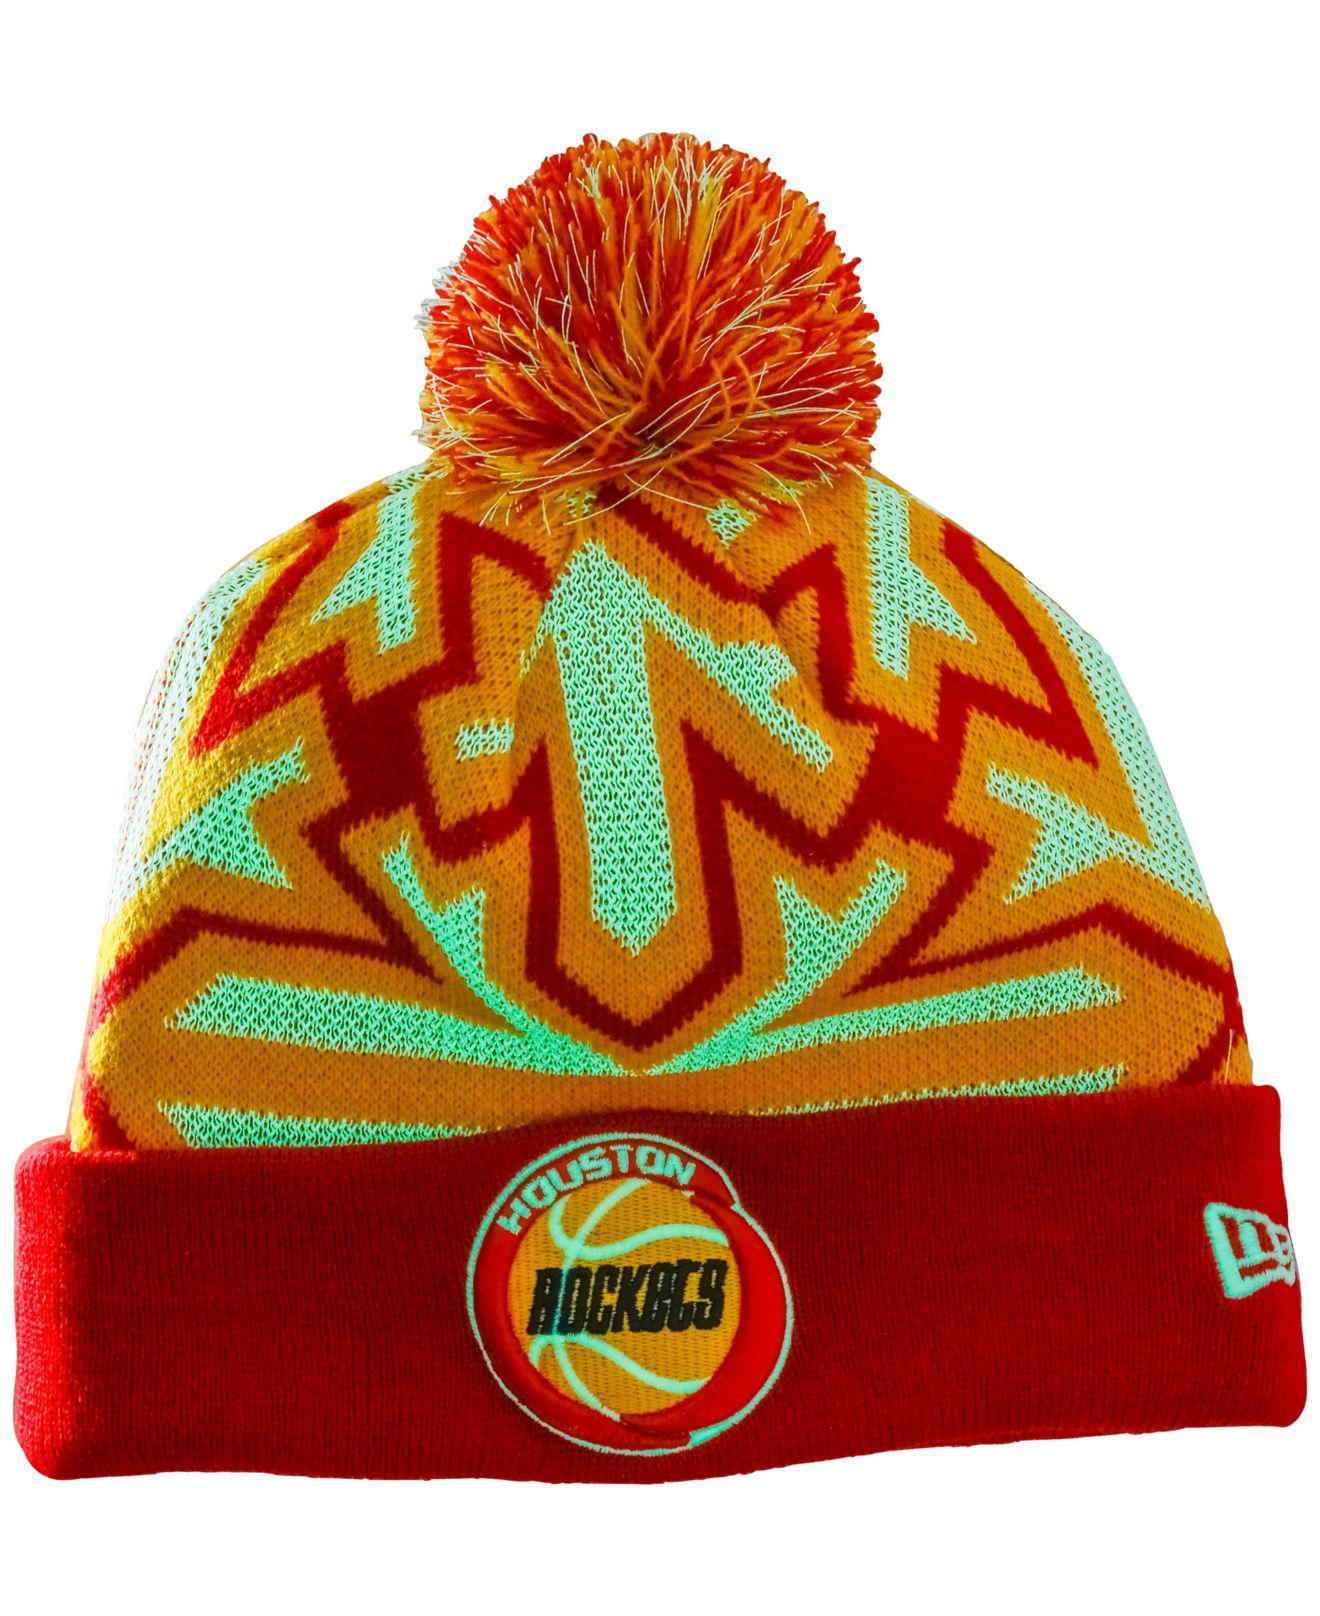 2ecfb9ccd59417 Lyst - KTZ Houston Rockets Glowflake Pom Knit Hat in Red for Men